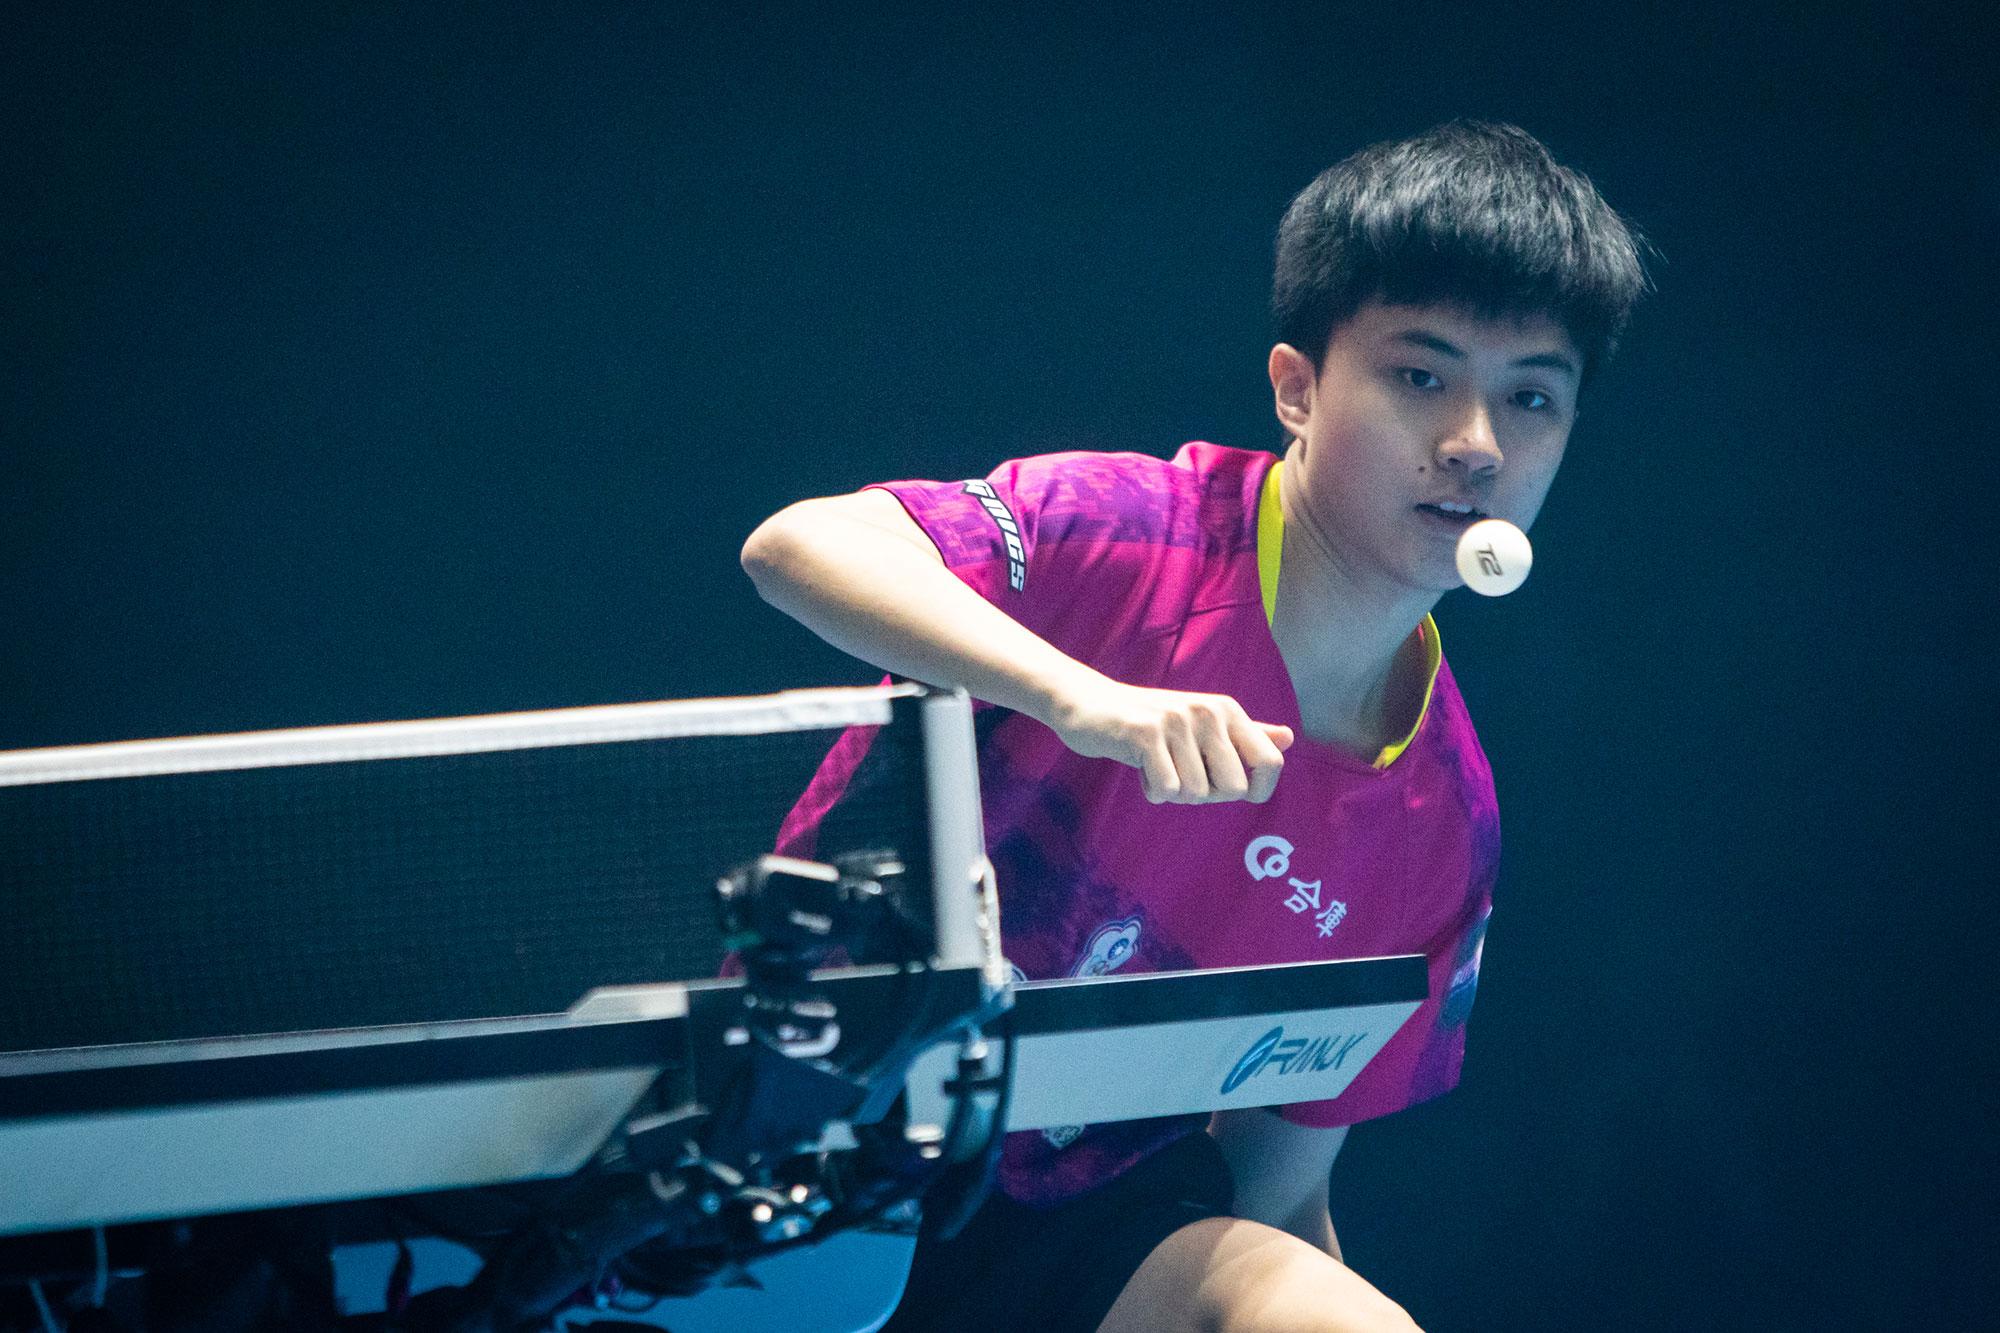 Match13_LINyungju_JANGwoojin_00073_HIGHRES